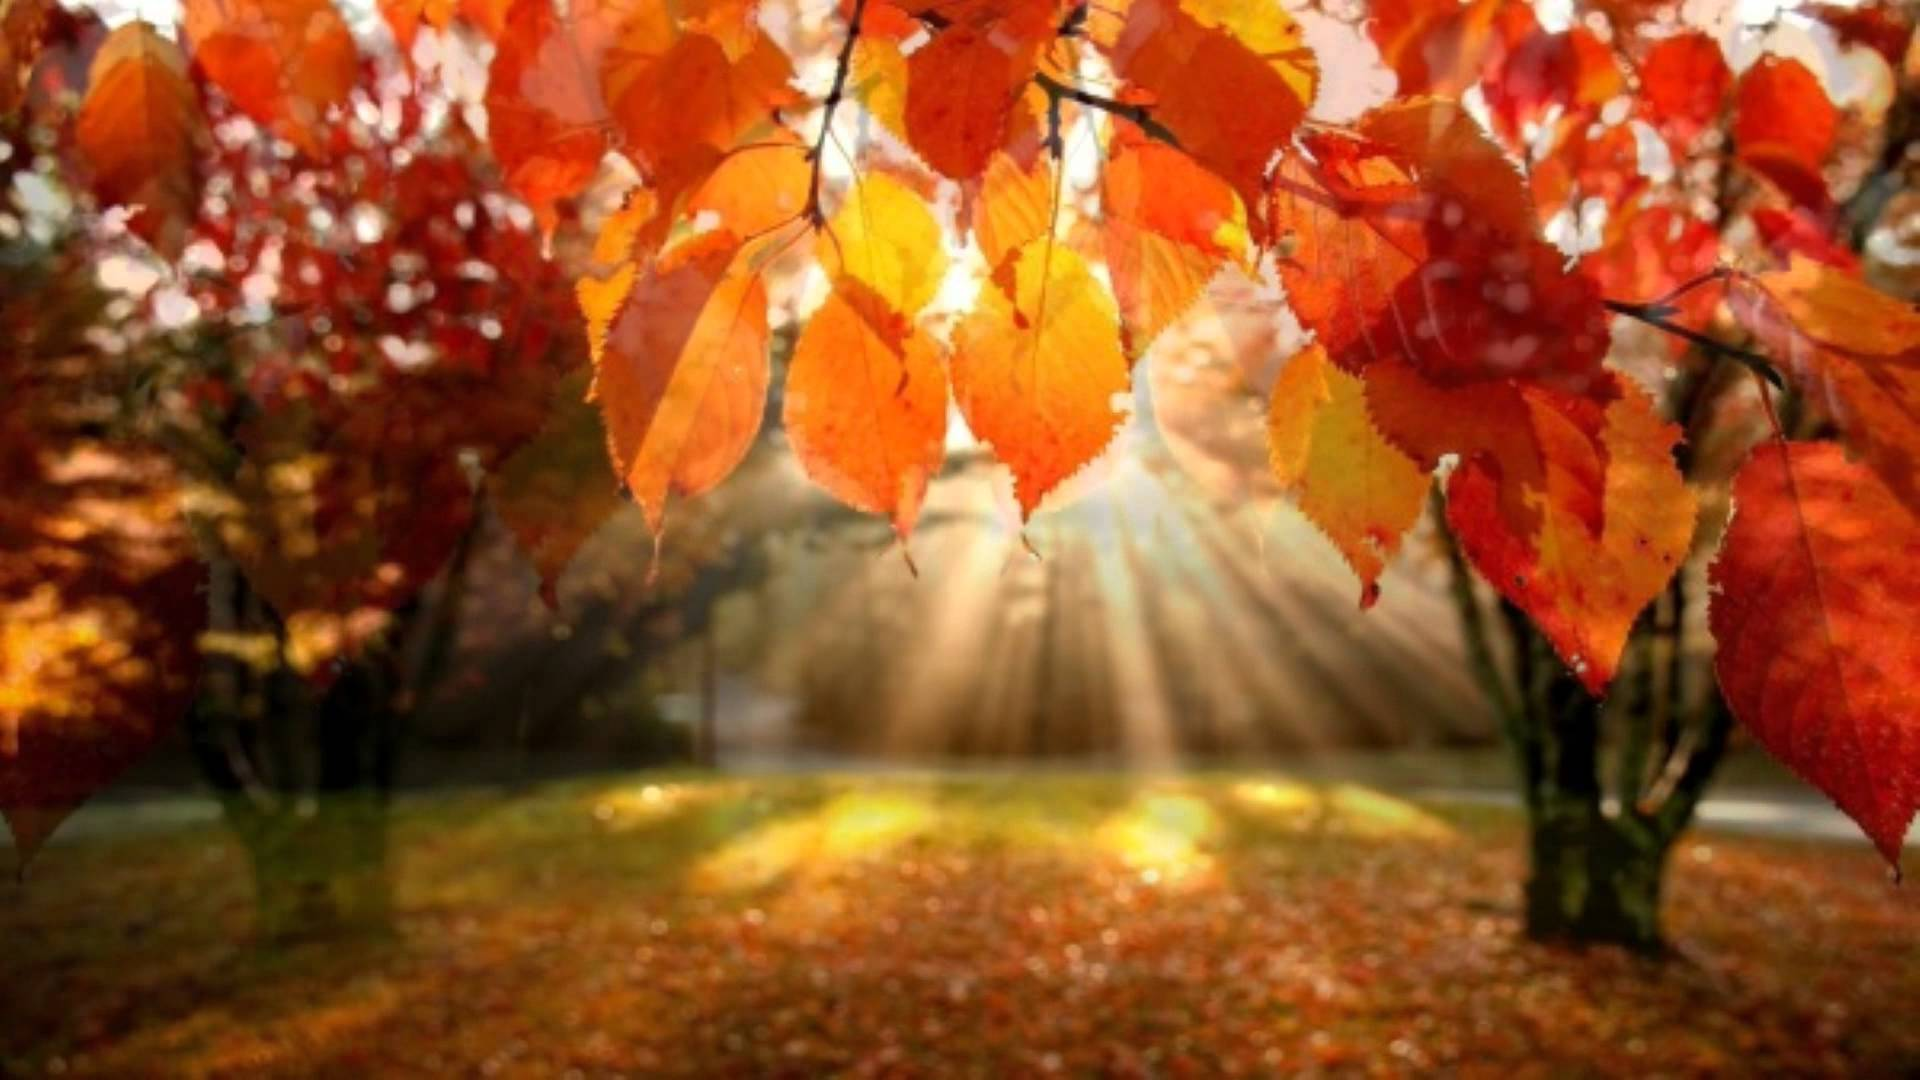 Falling Leaves Hd Live Wallpaper Fall Events 2017